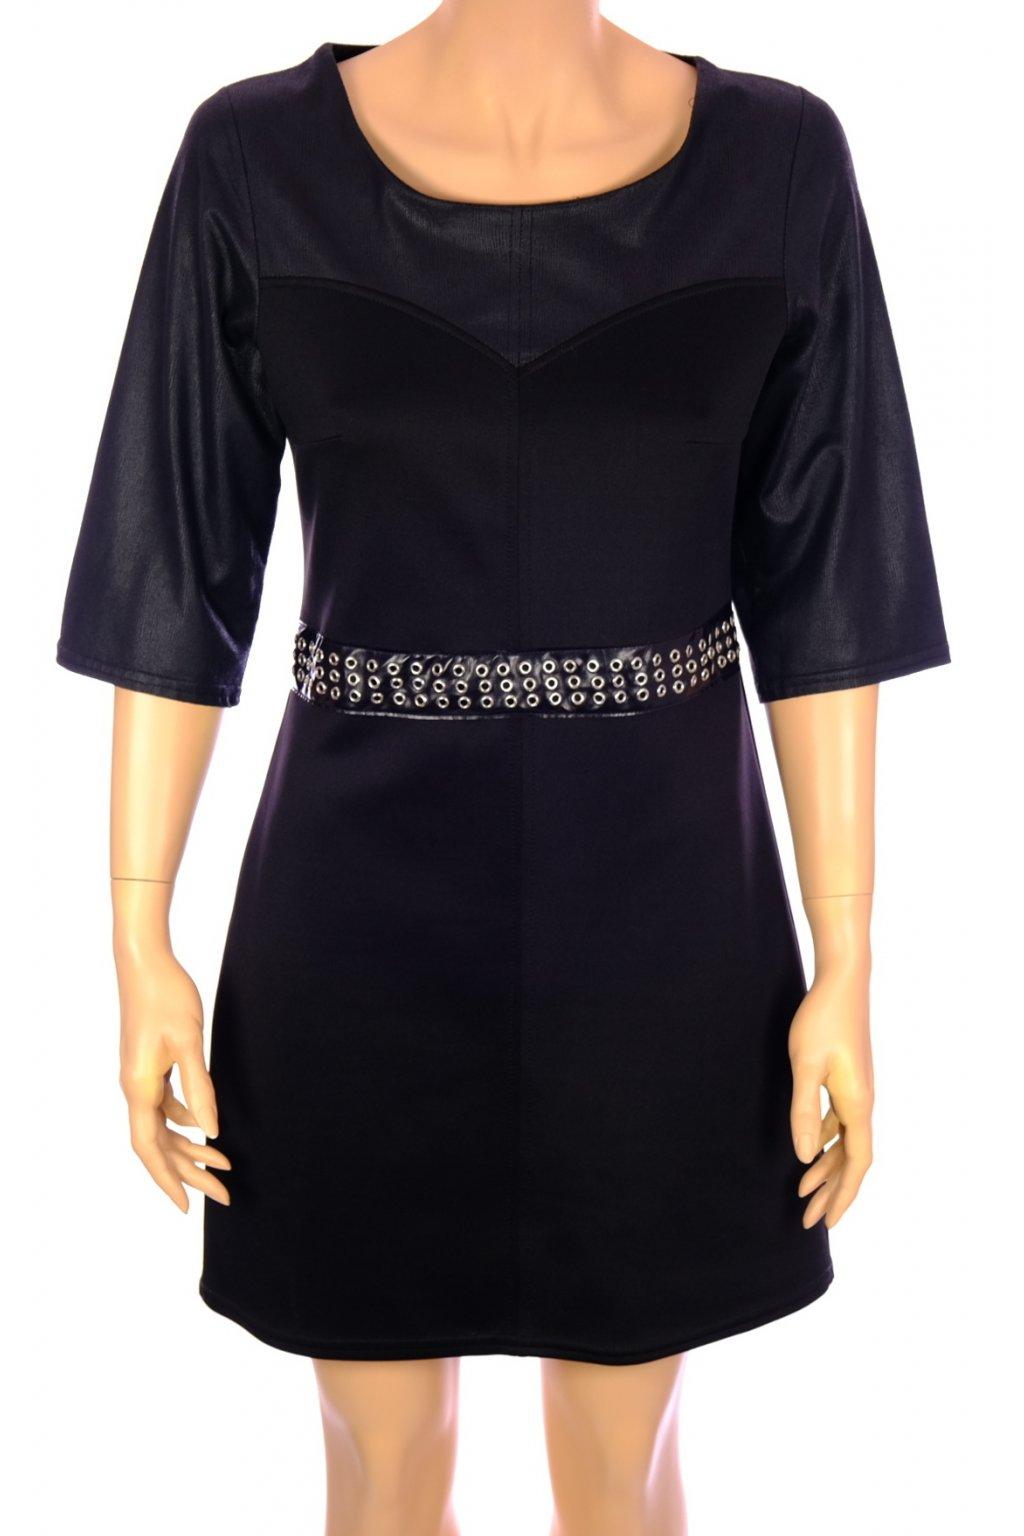 Šaty Quinze heures vel M černé